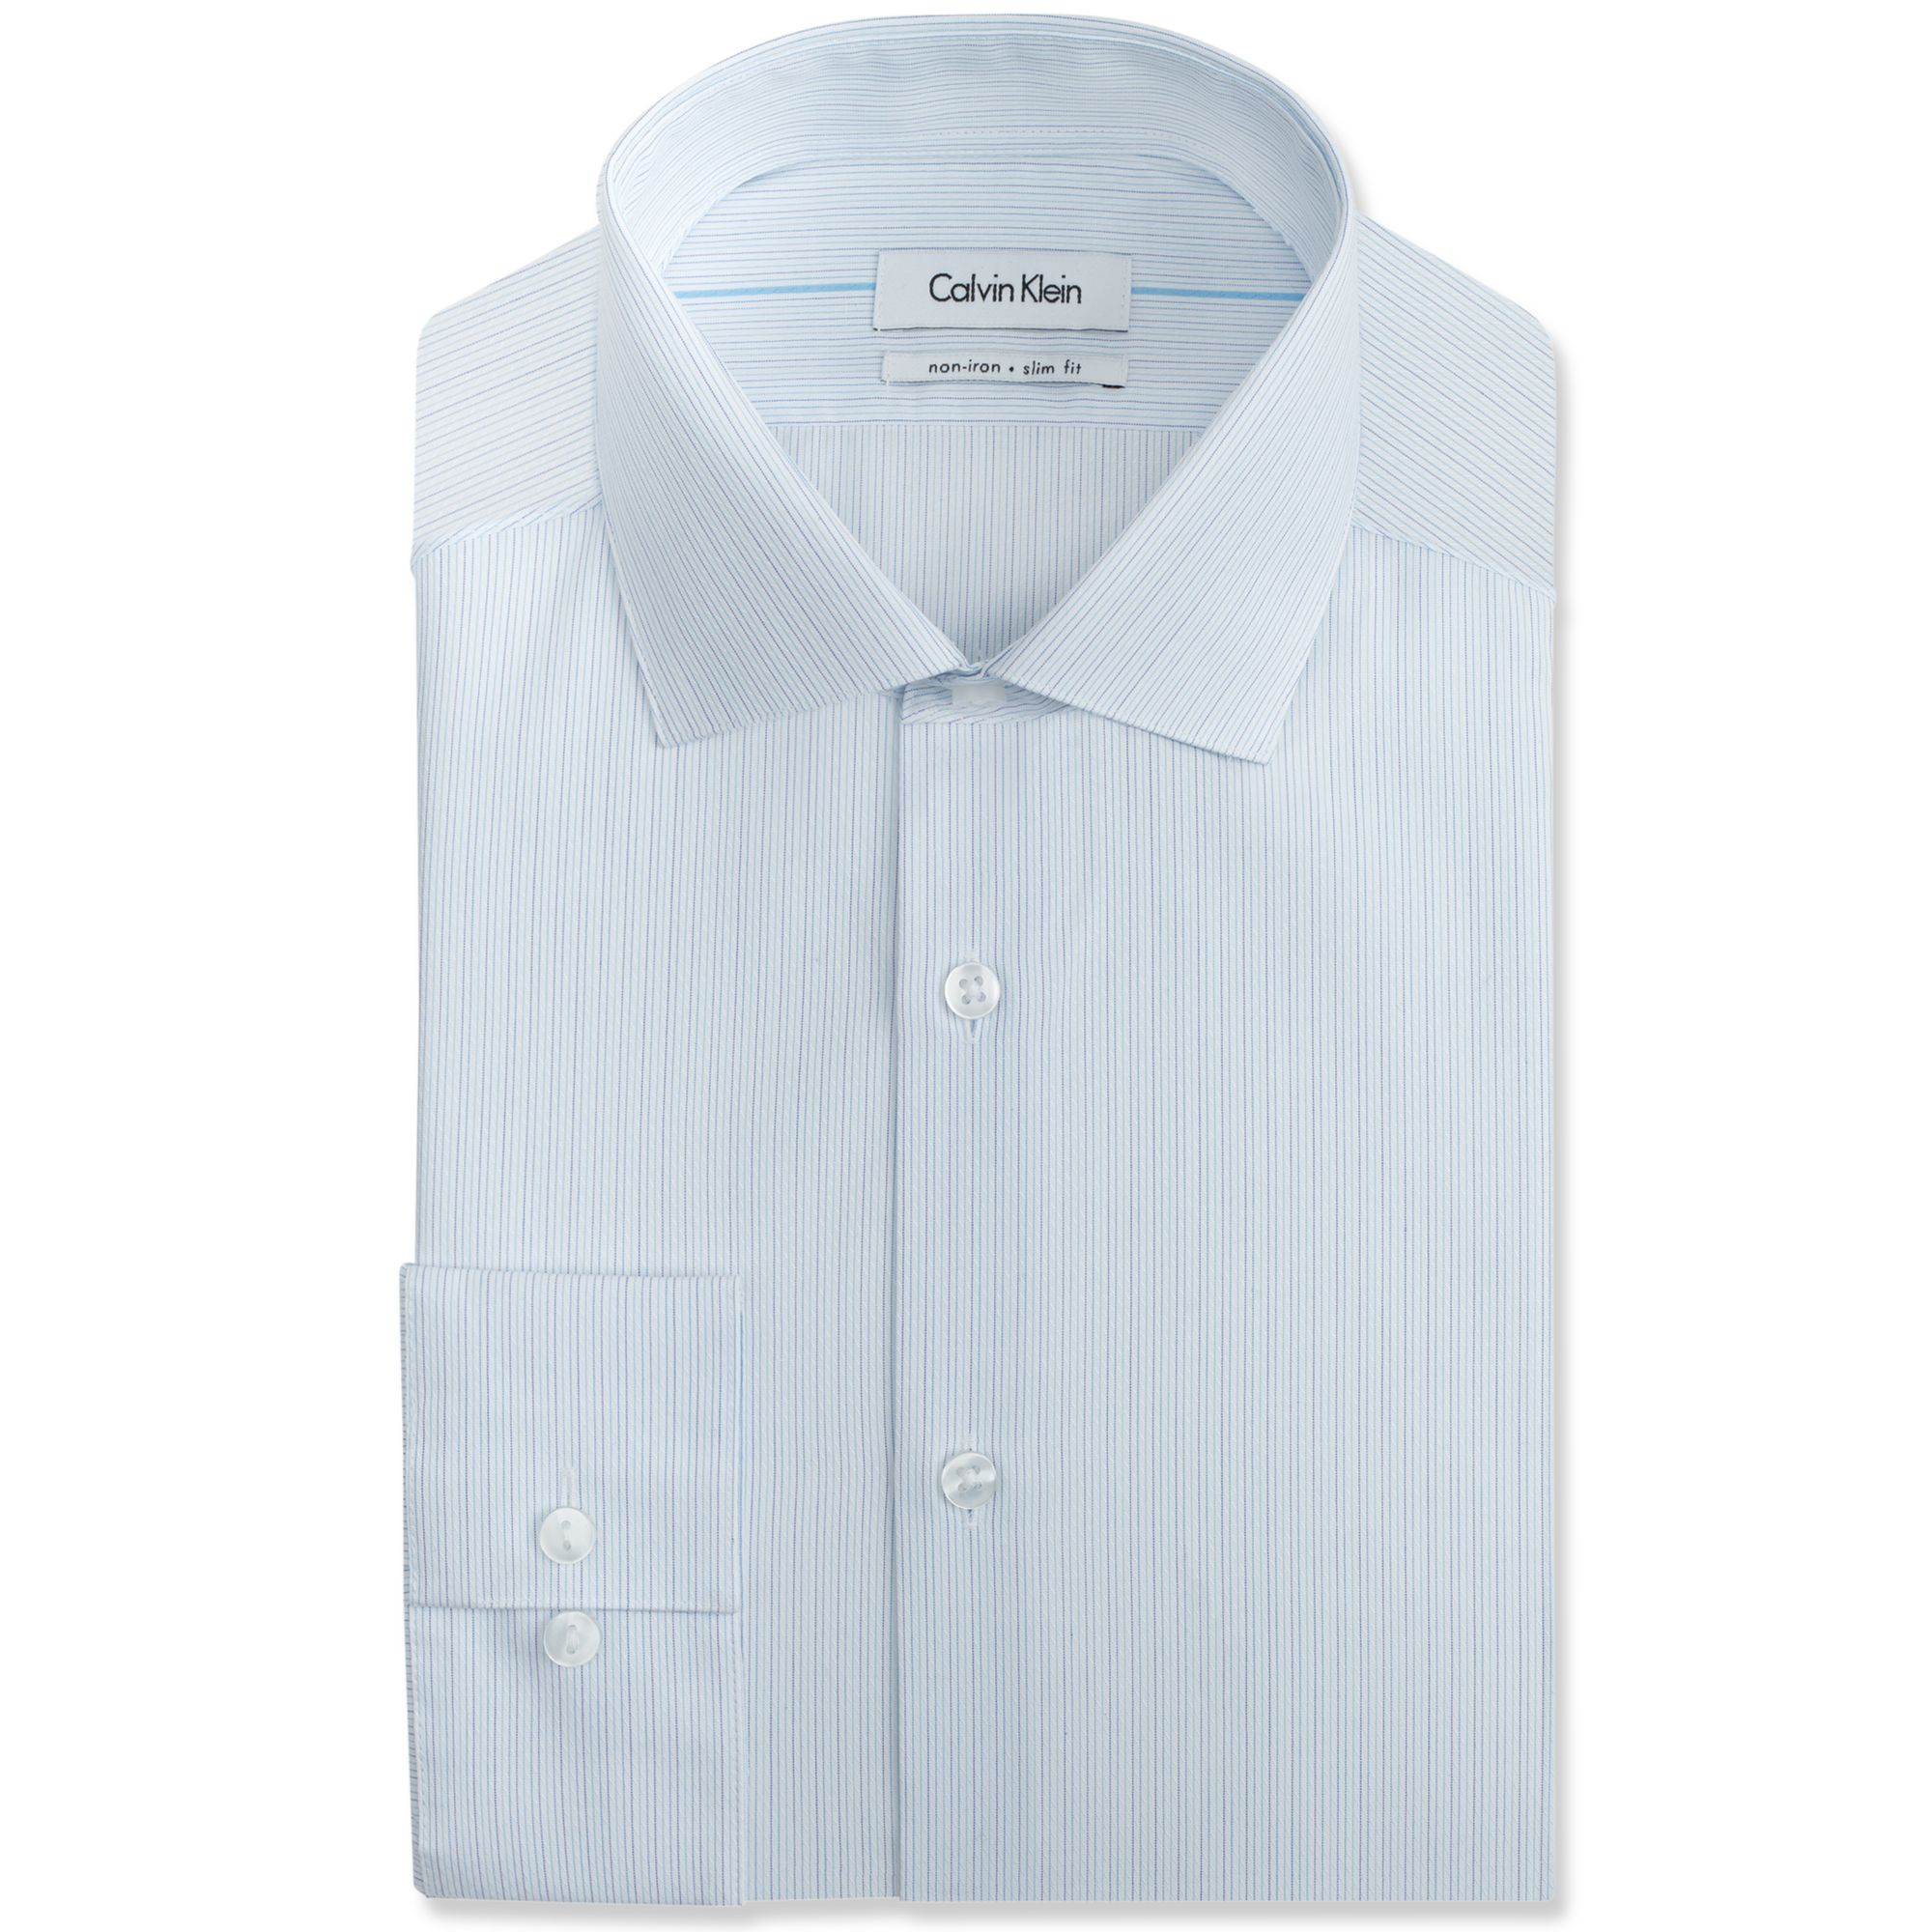 calvin klein no iron shirts